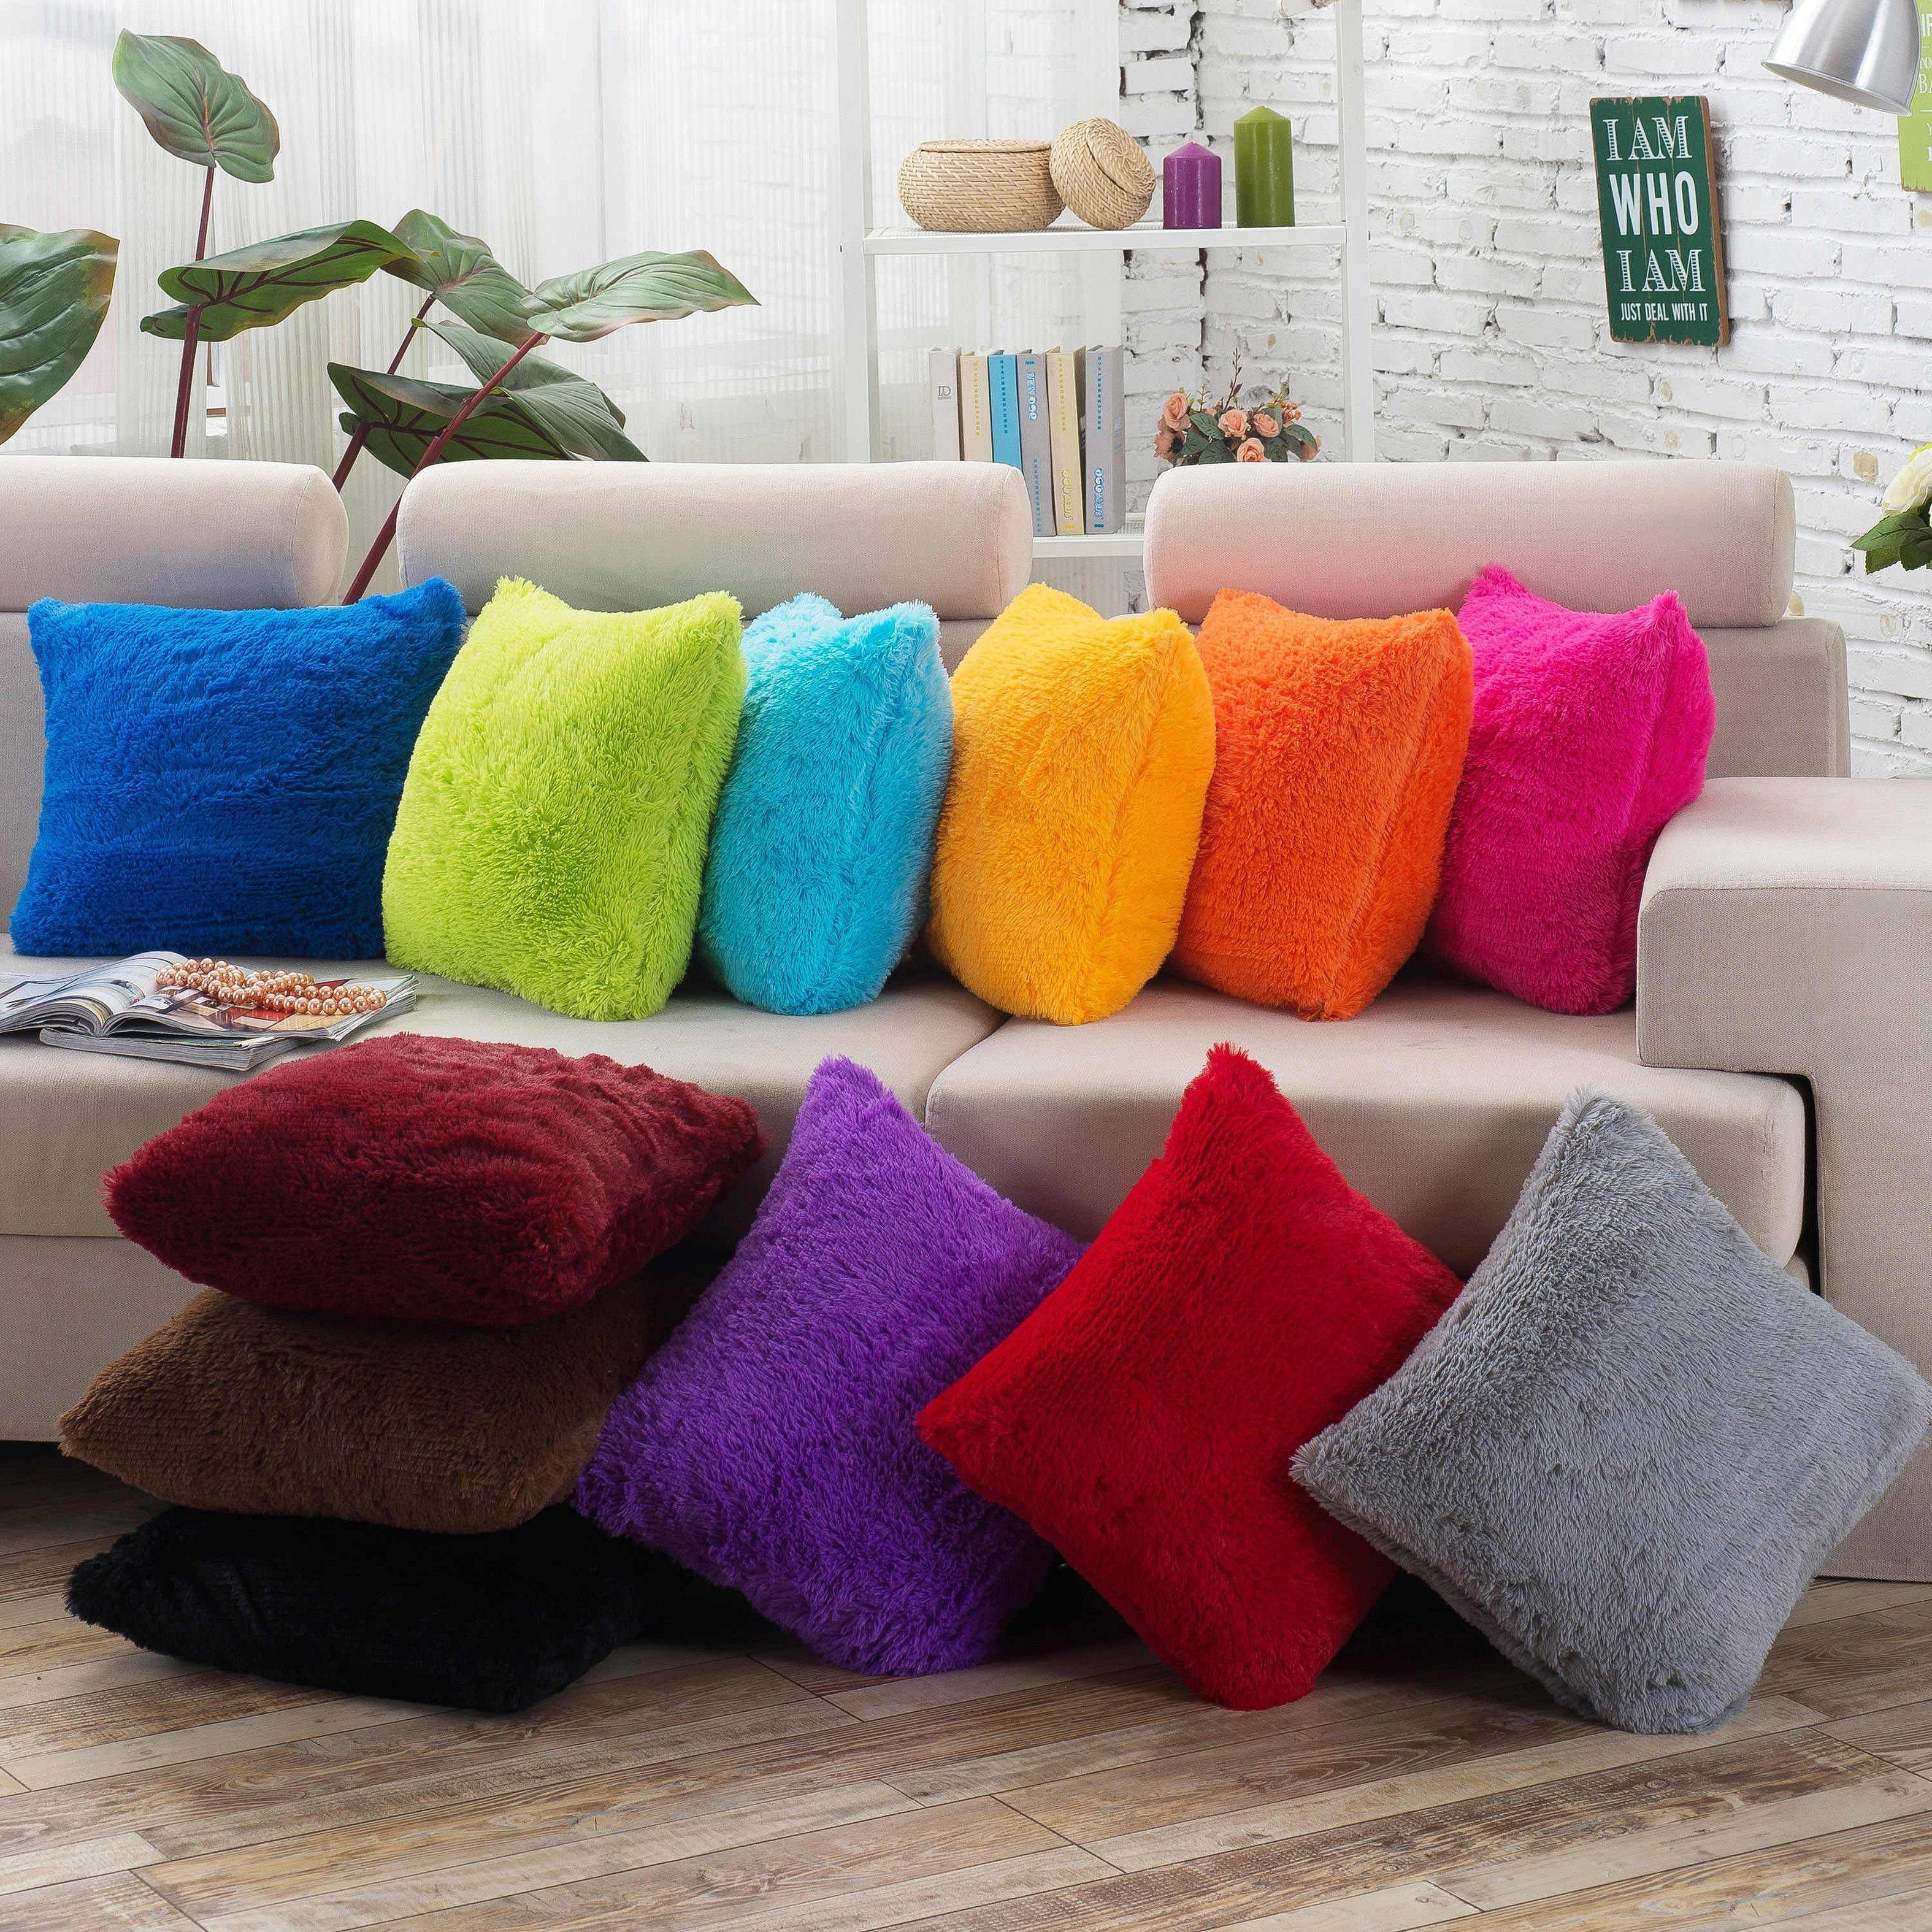 Пушистые наволочки на подушки для дивана